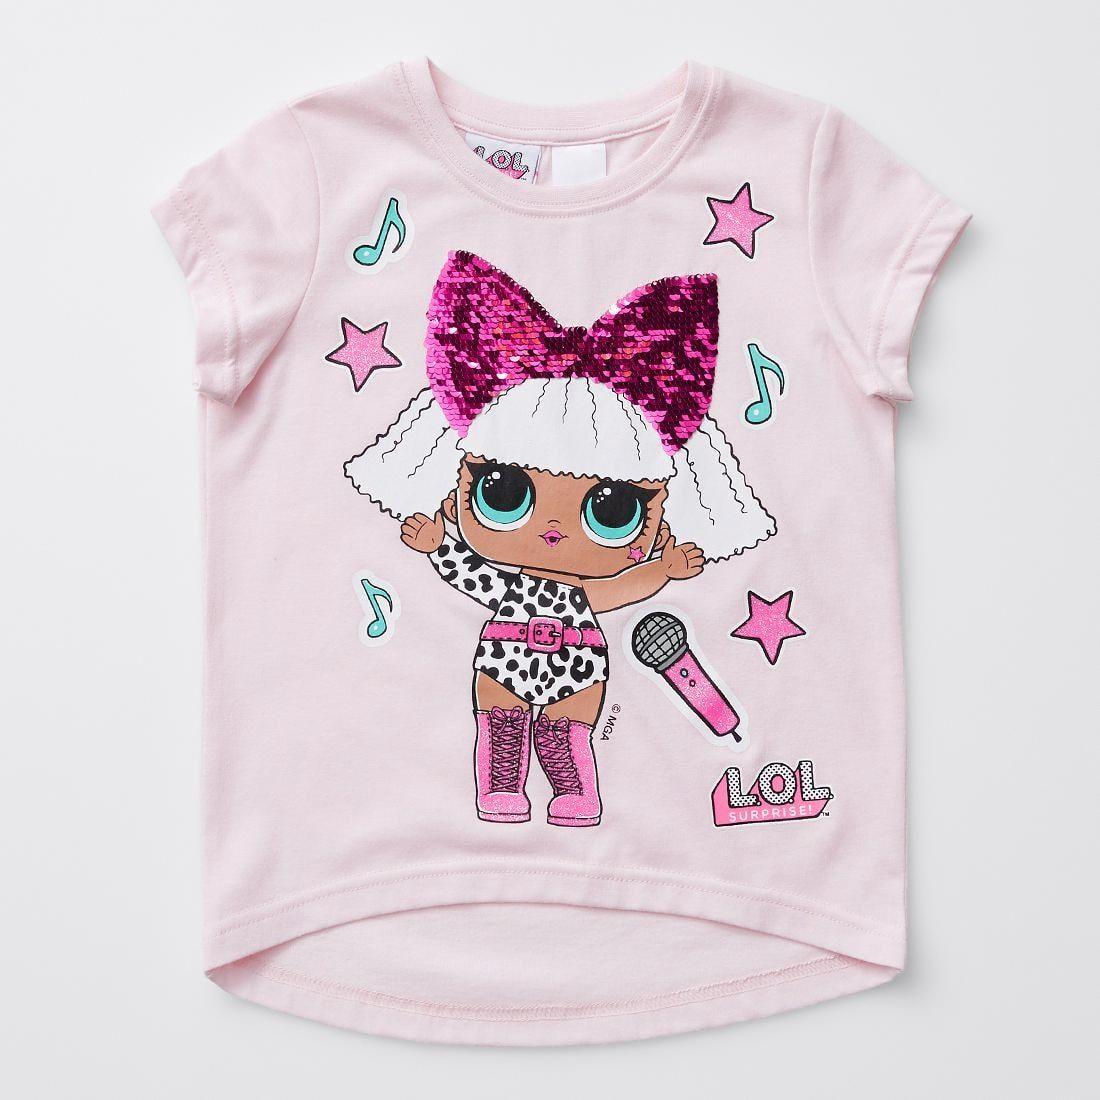 Build a Bear Full Size Teddy Bear Clothing ~ Girls Aloha Tank Top Shirt